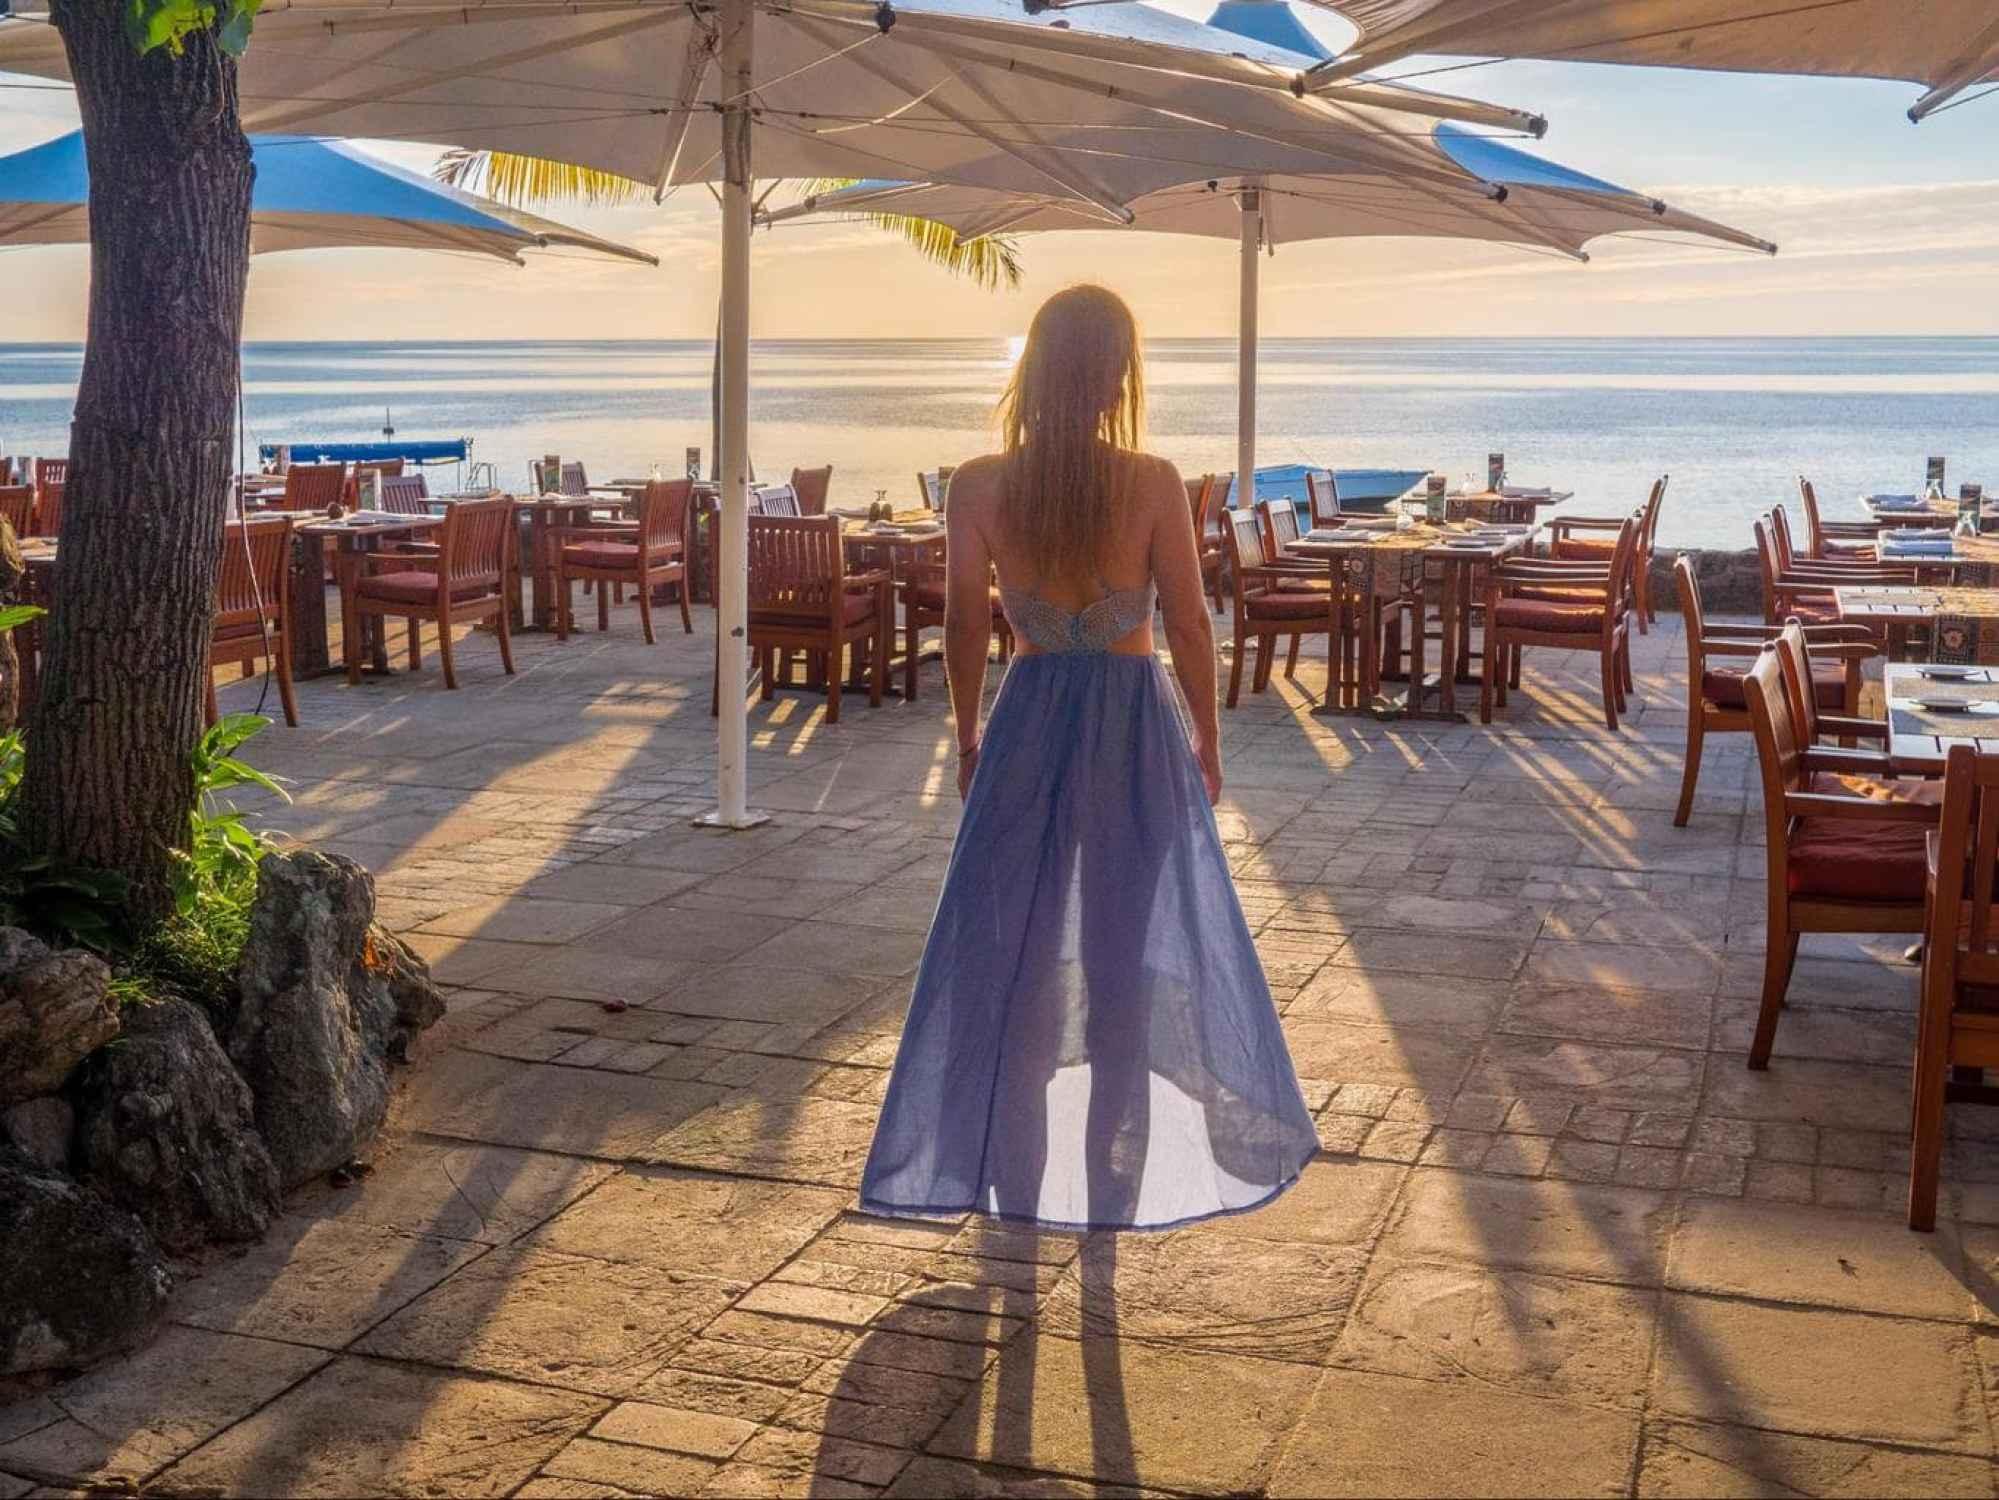 Water's edge restaurant at Castaway Island